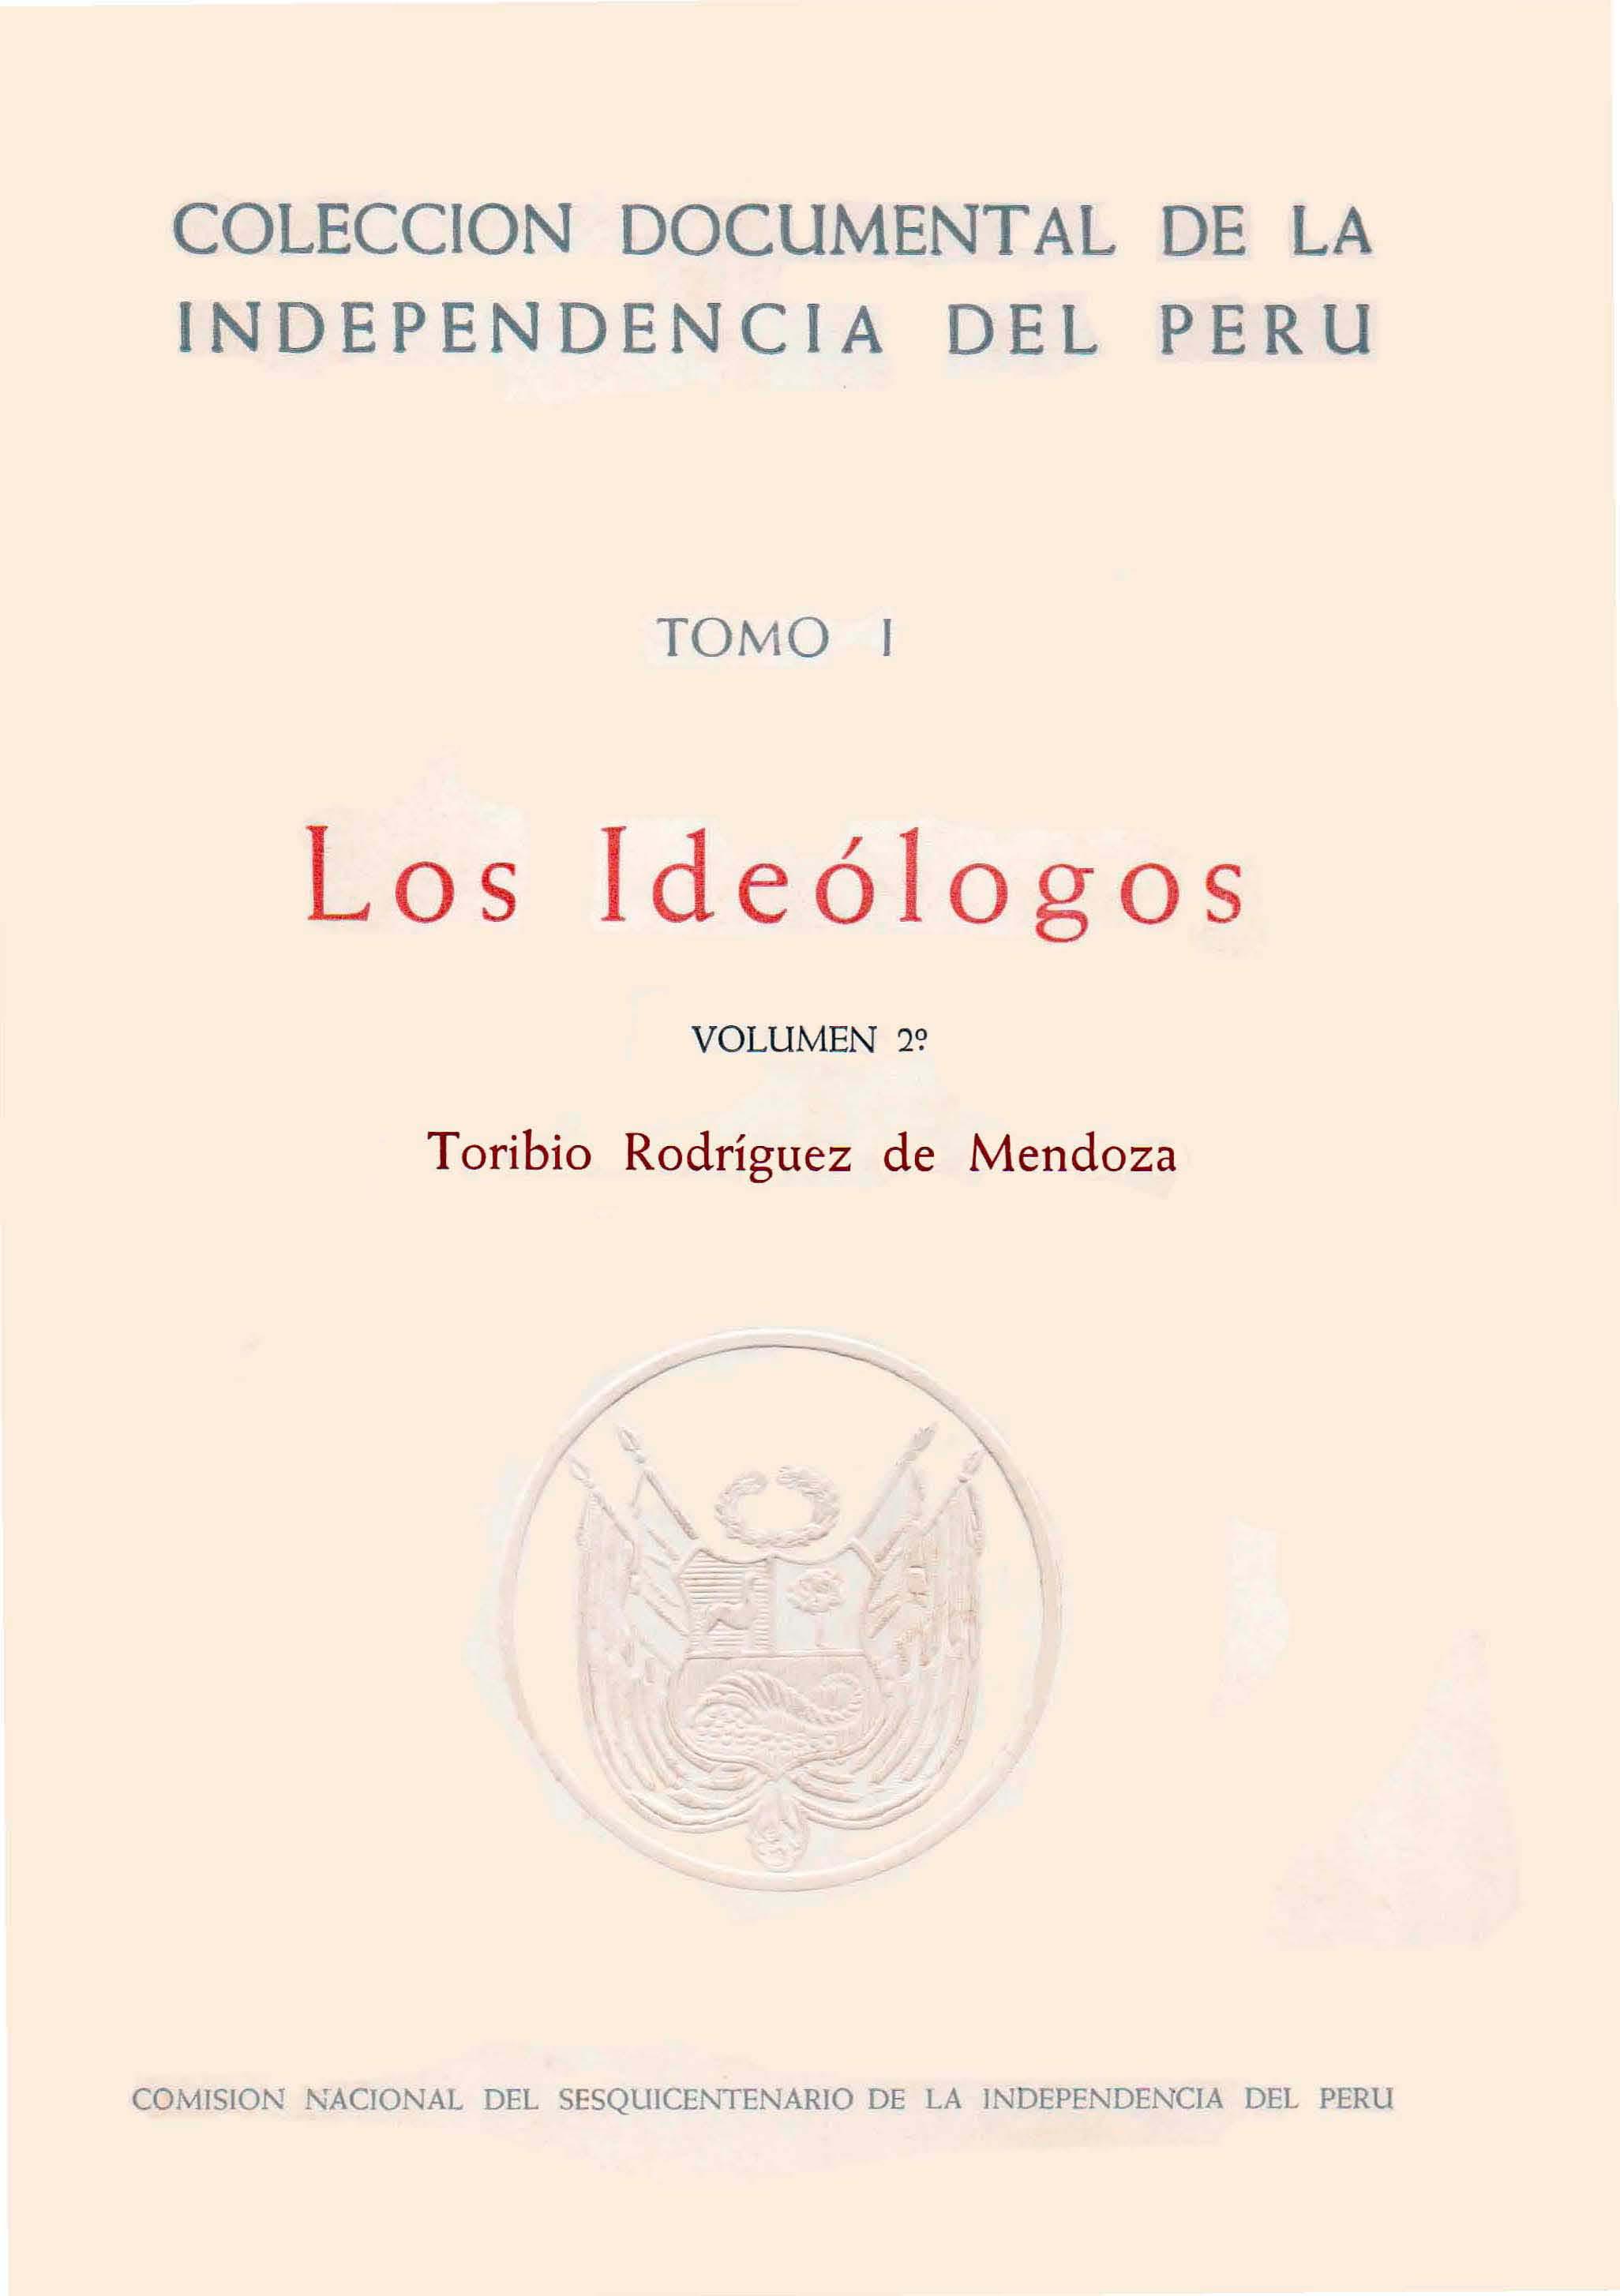 Los ideólogos: Toribi...